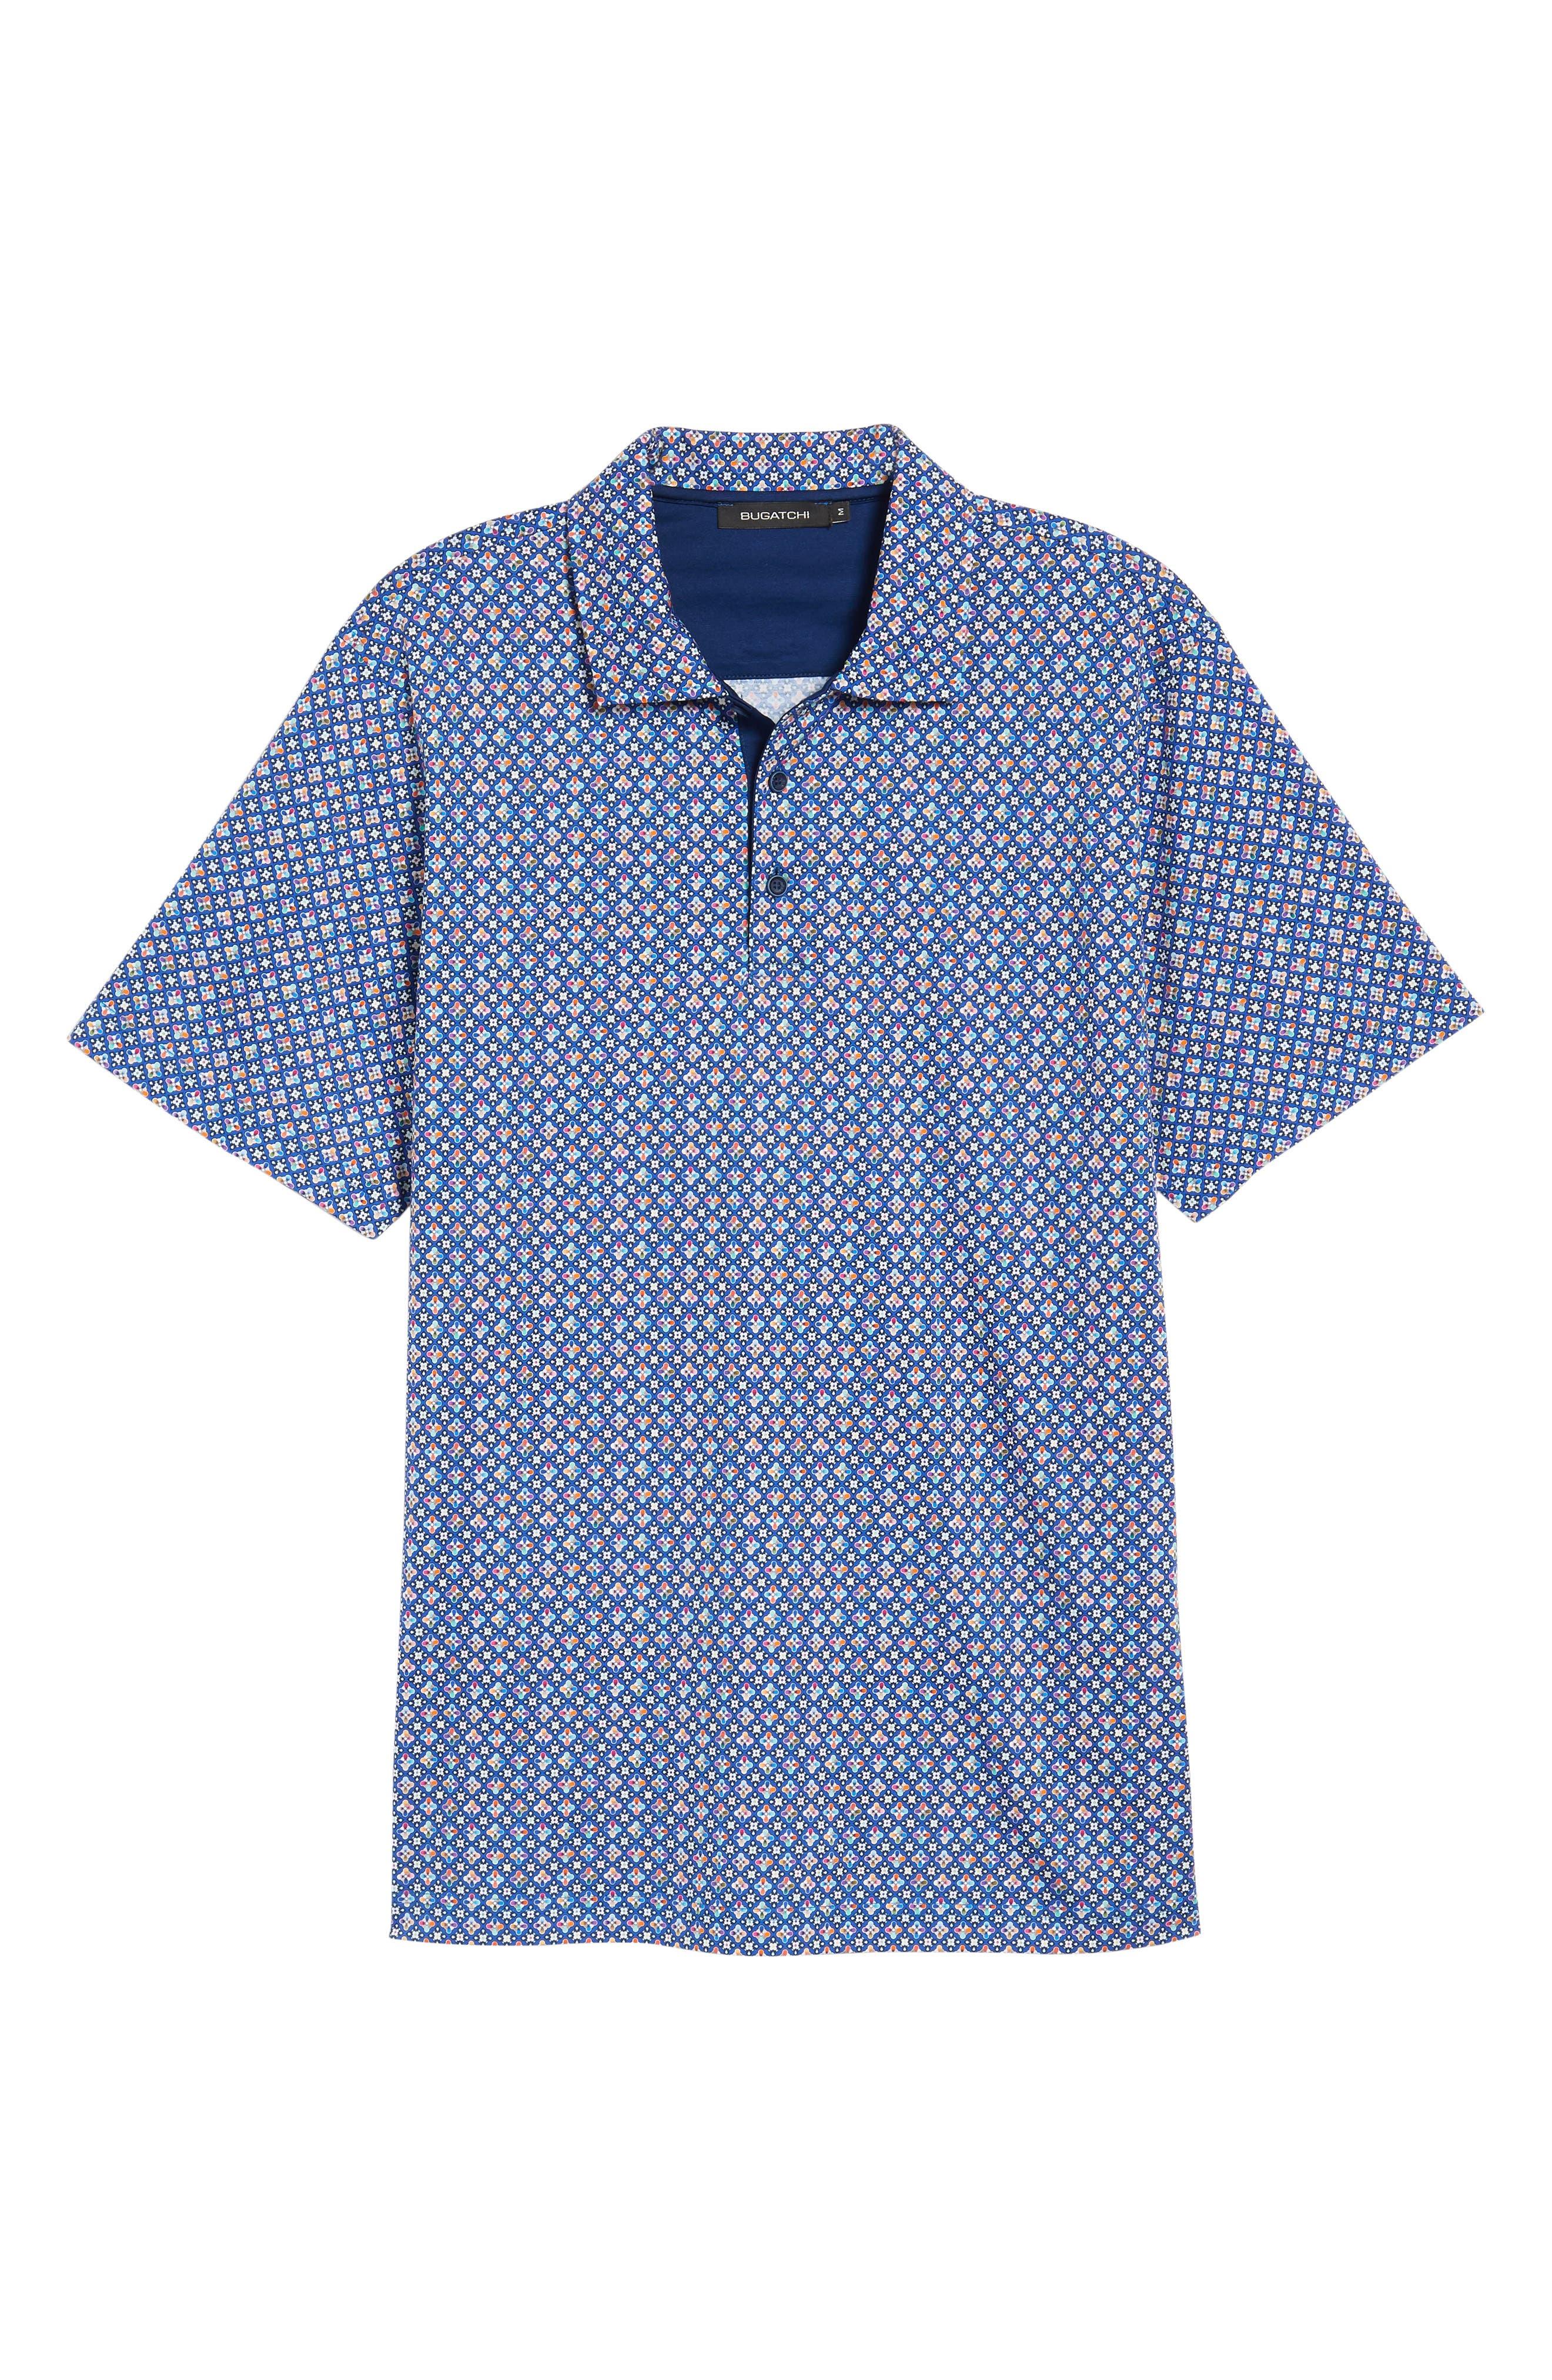 Regular Fit Knit Polo,                             Alternate thumbnail 6, color,